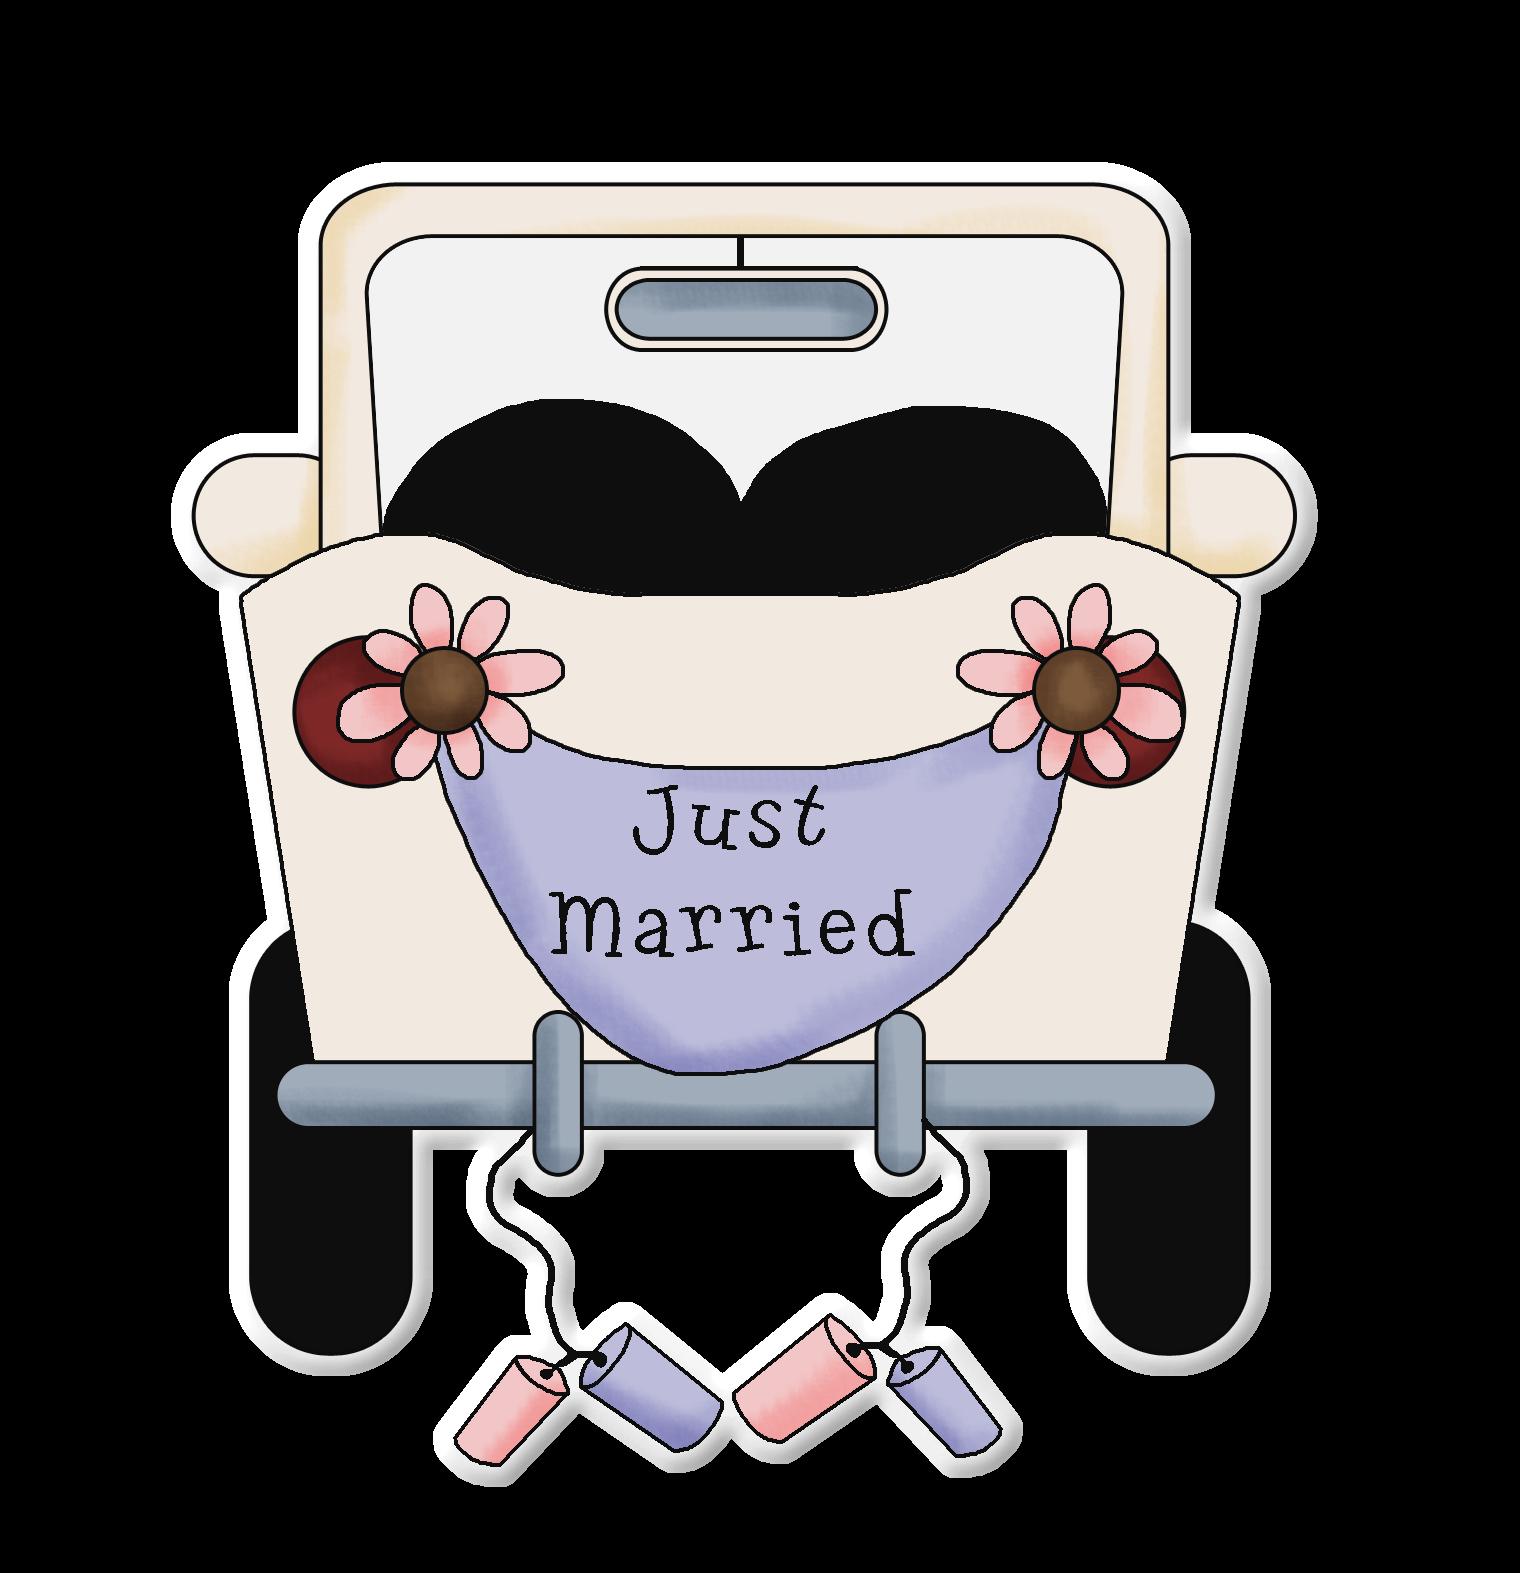 SGBlogosfera Wedding Day  Ilustraciones  Pinterest  Boda